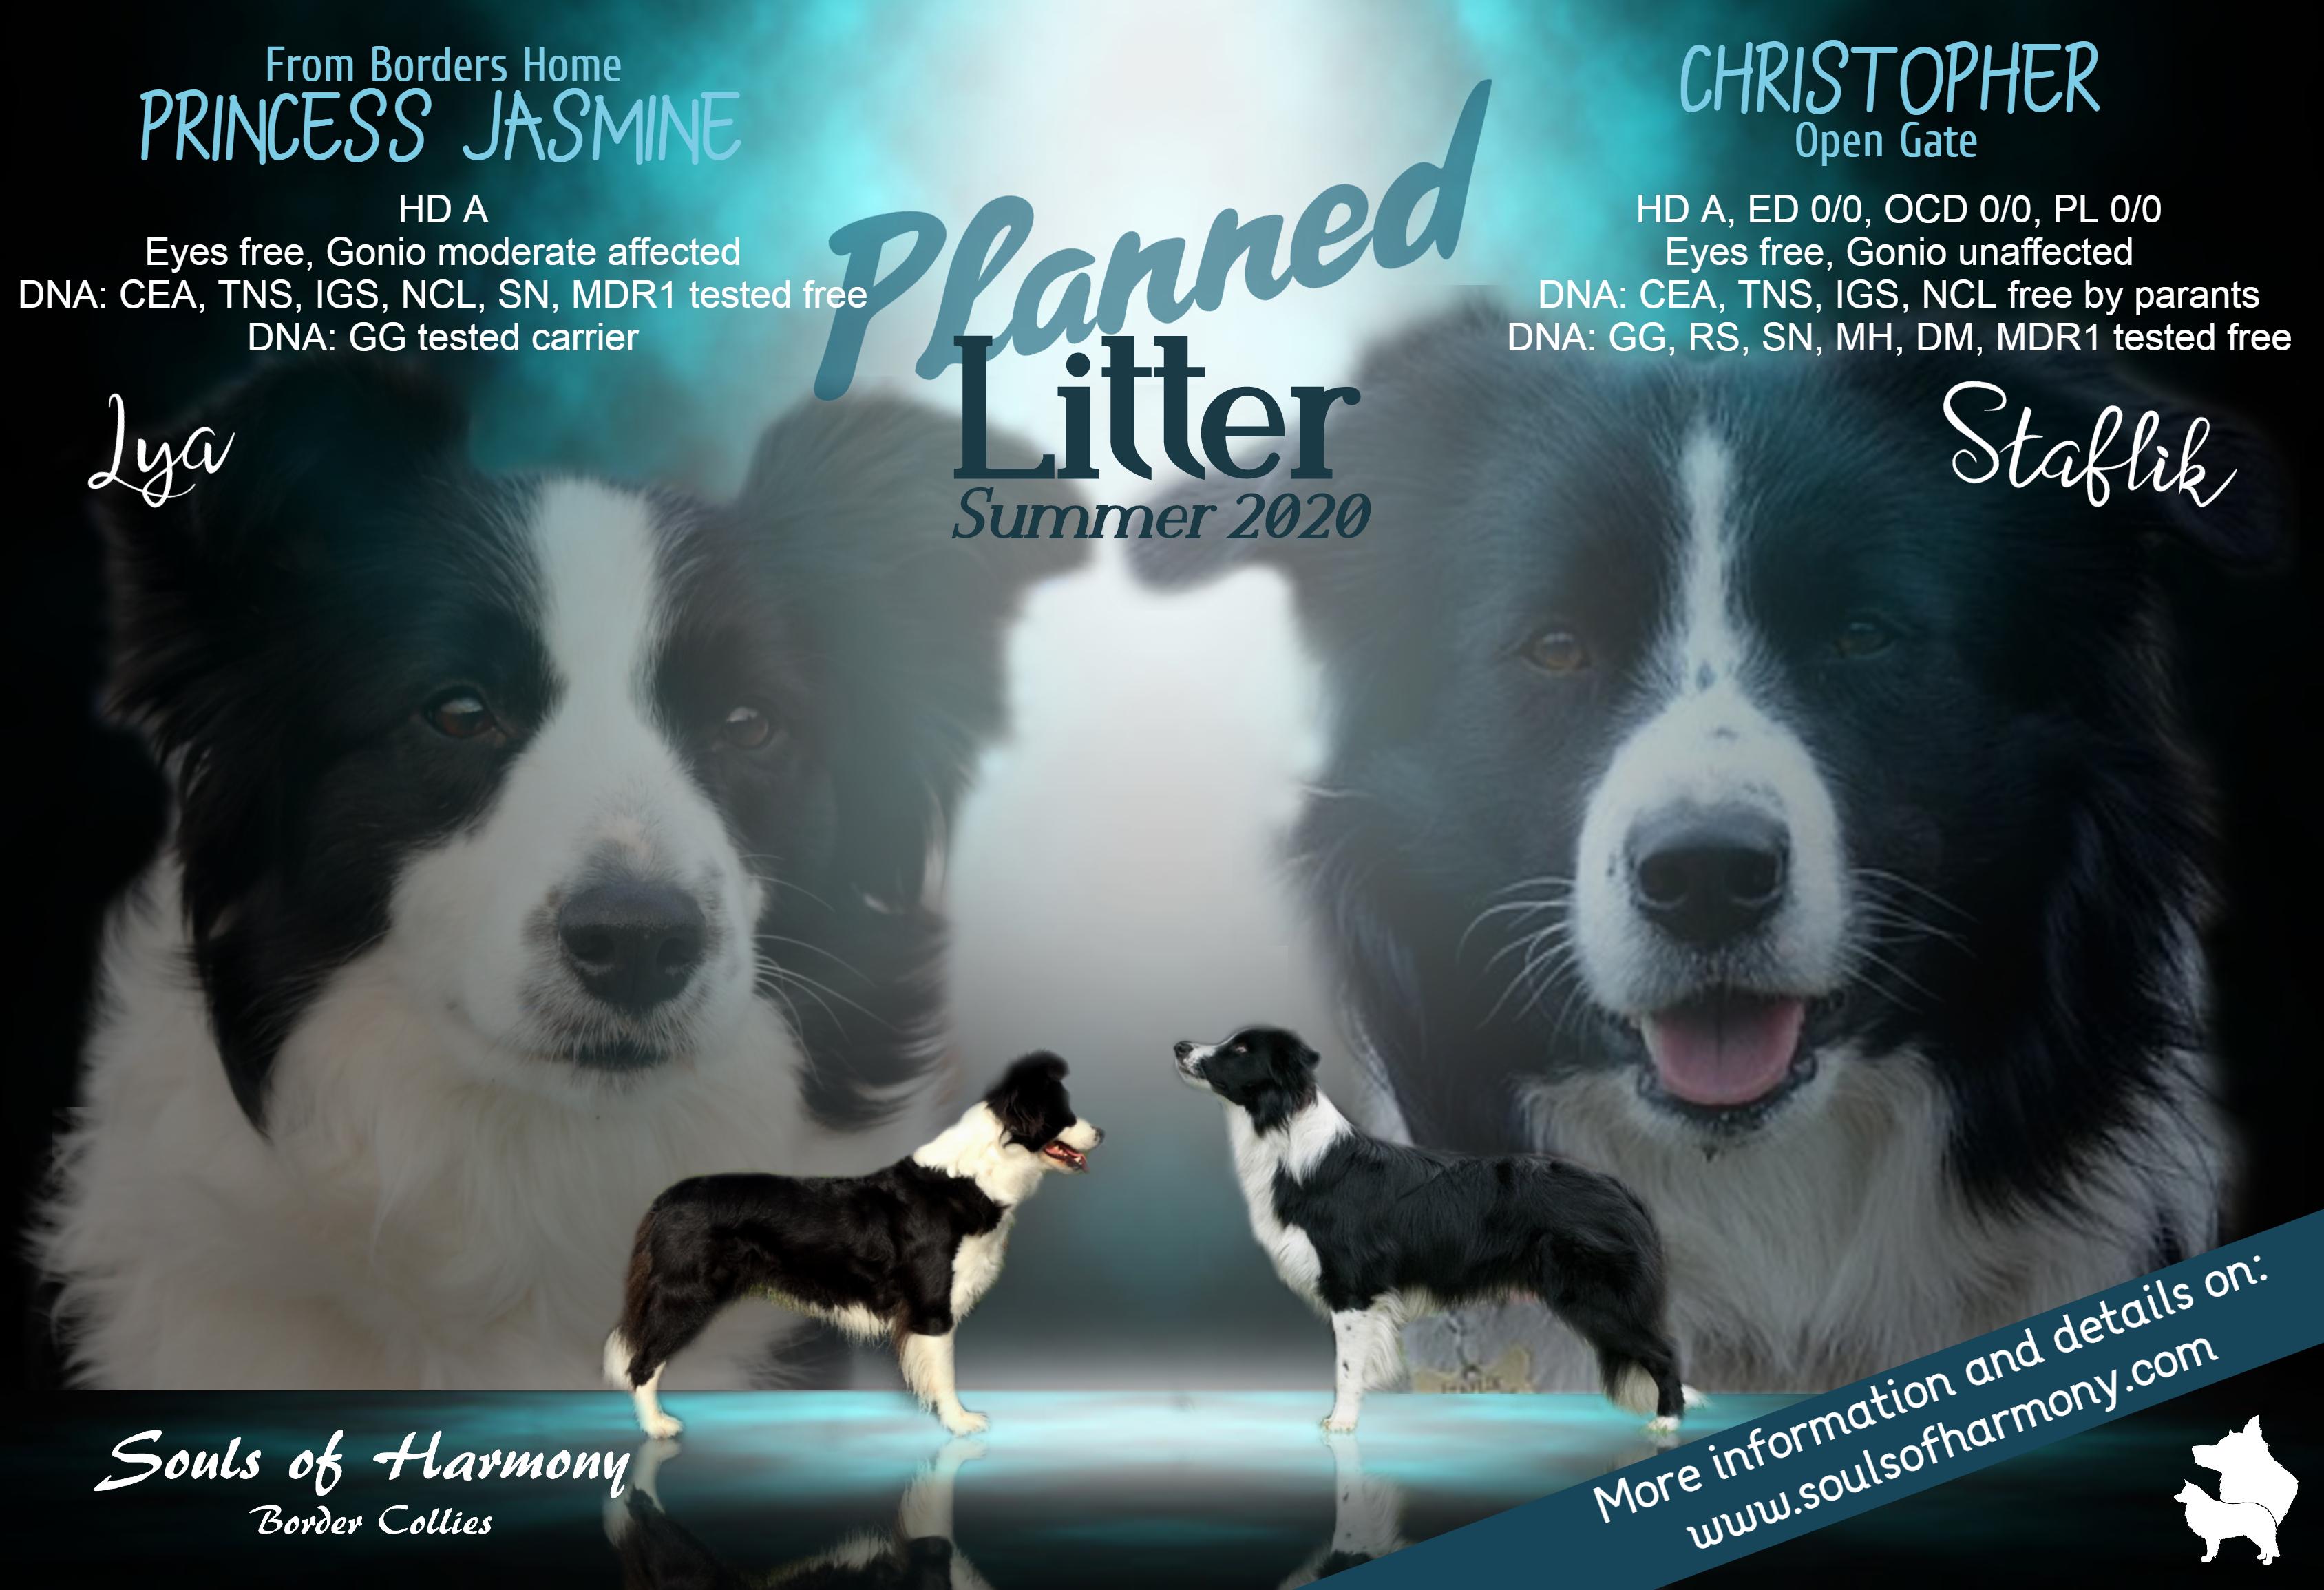 SOH_Planned litter_Summer 2020